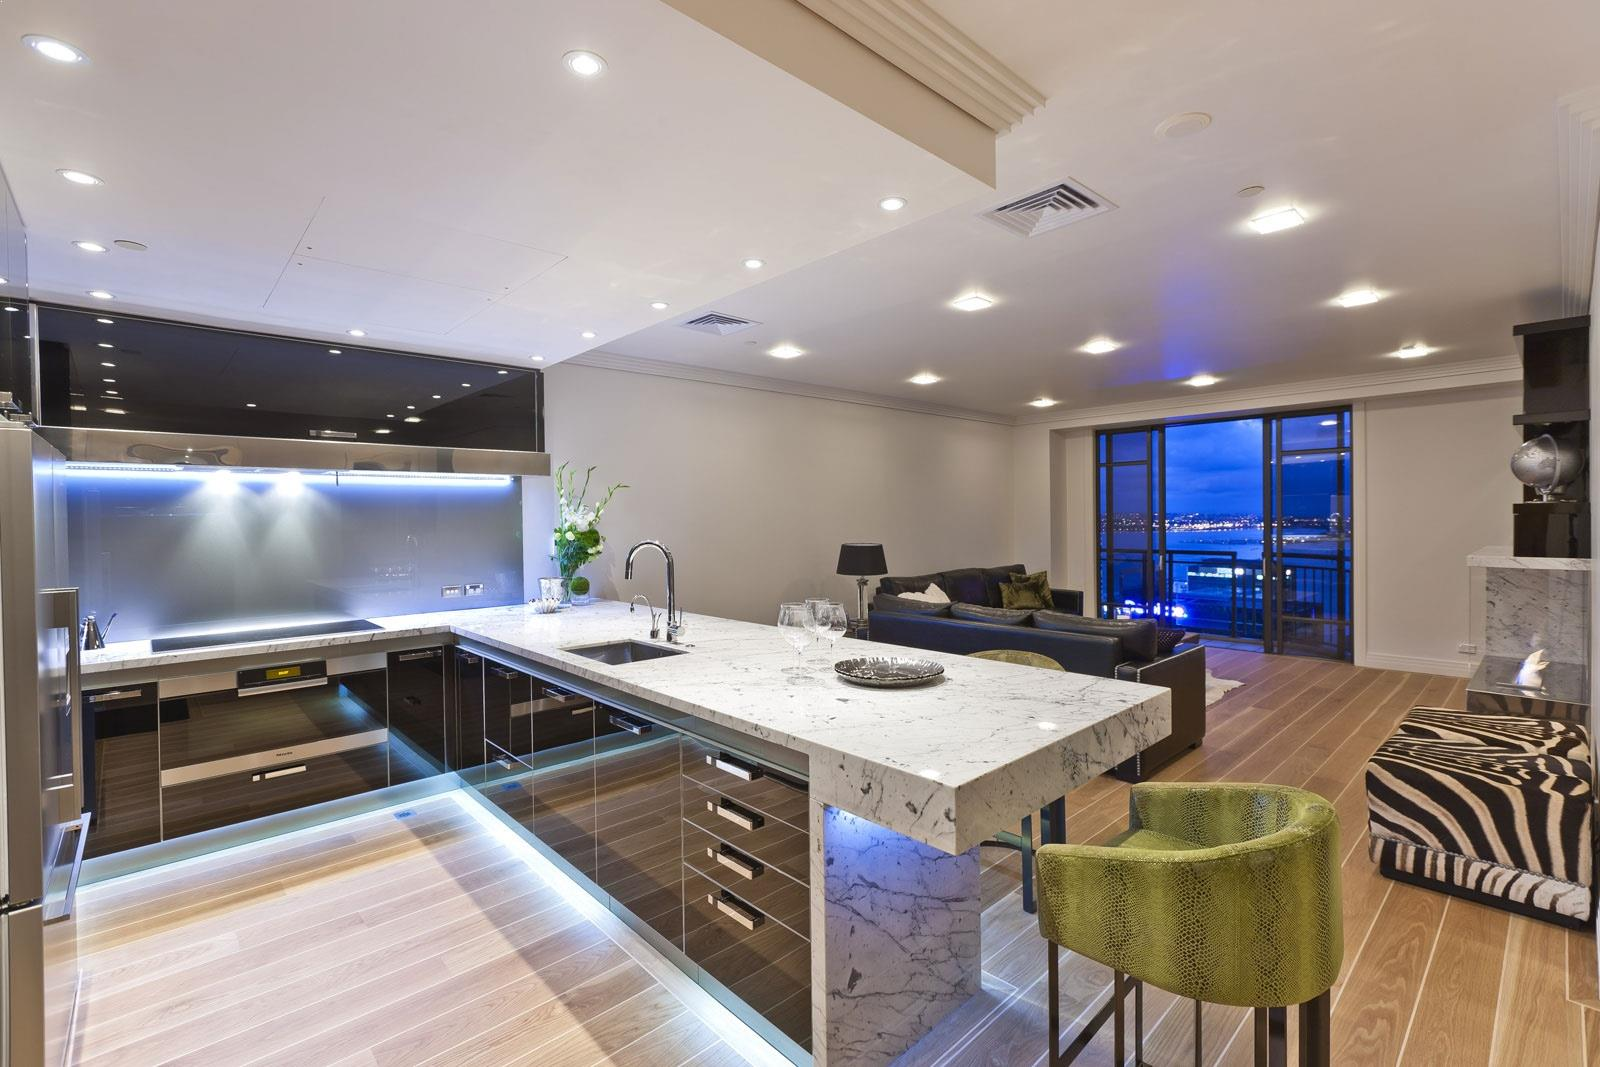 Luxurious Modern Kitchen Design Home Interior Exterior Decor Design Ideas